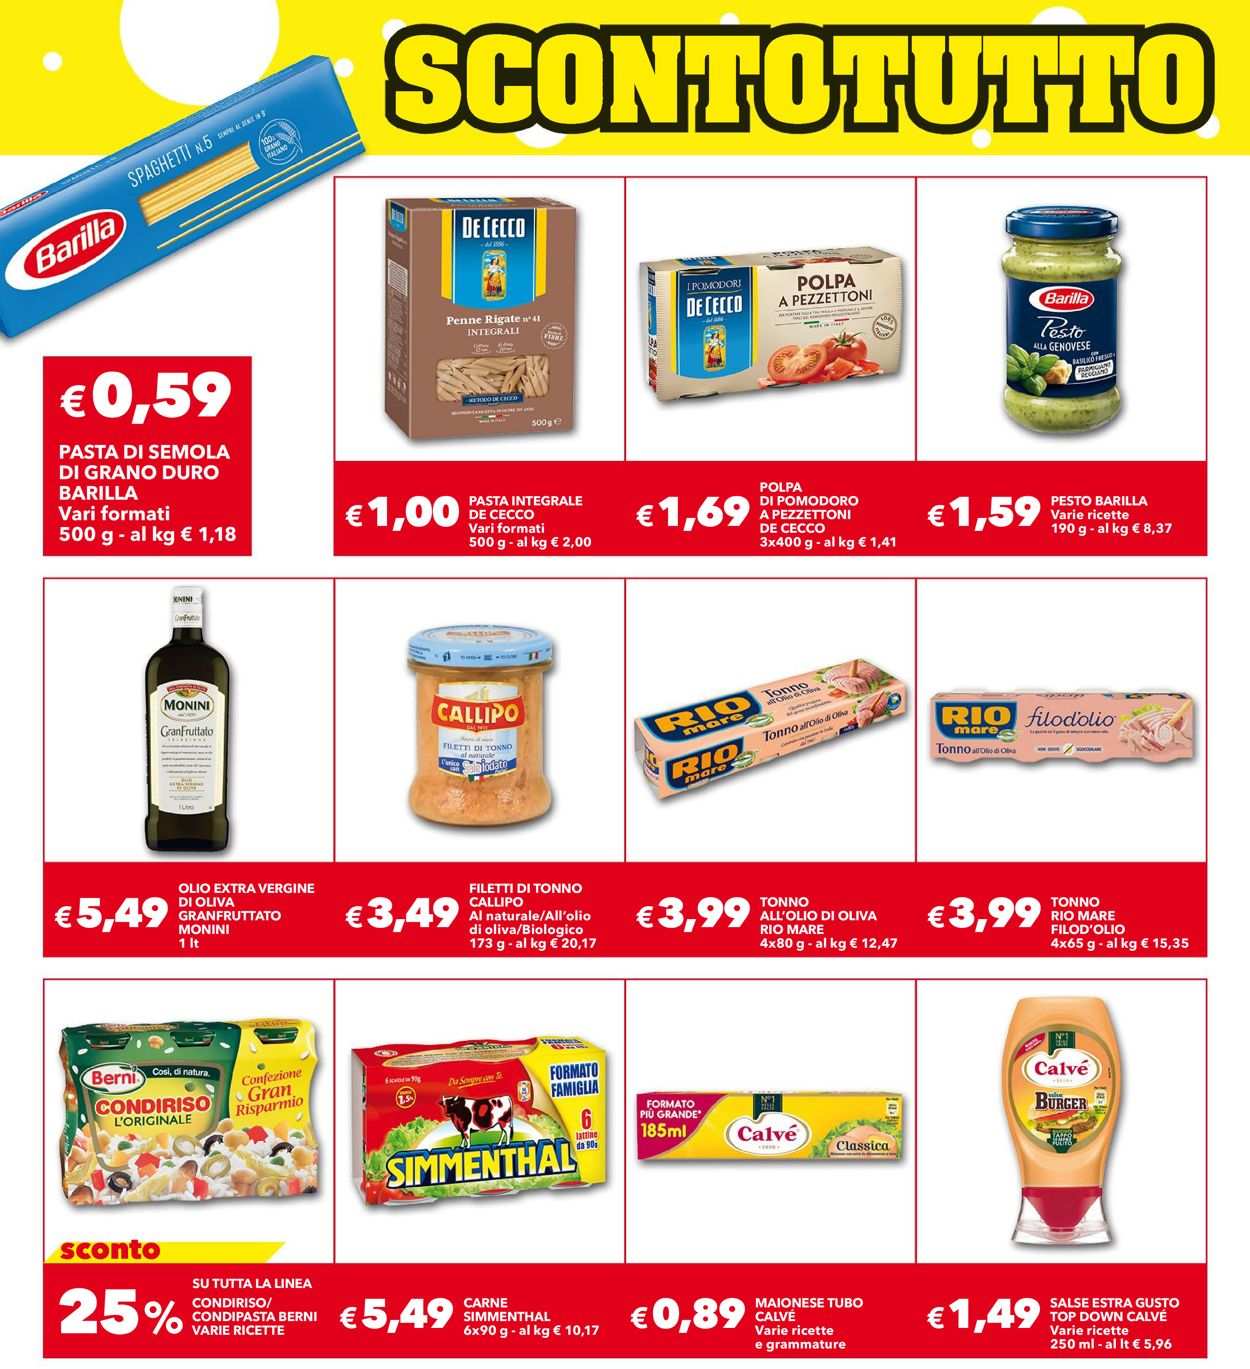 Volantino Auchan - Offerte 30/07-12/08/2020 (Pagina 10)